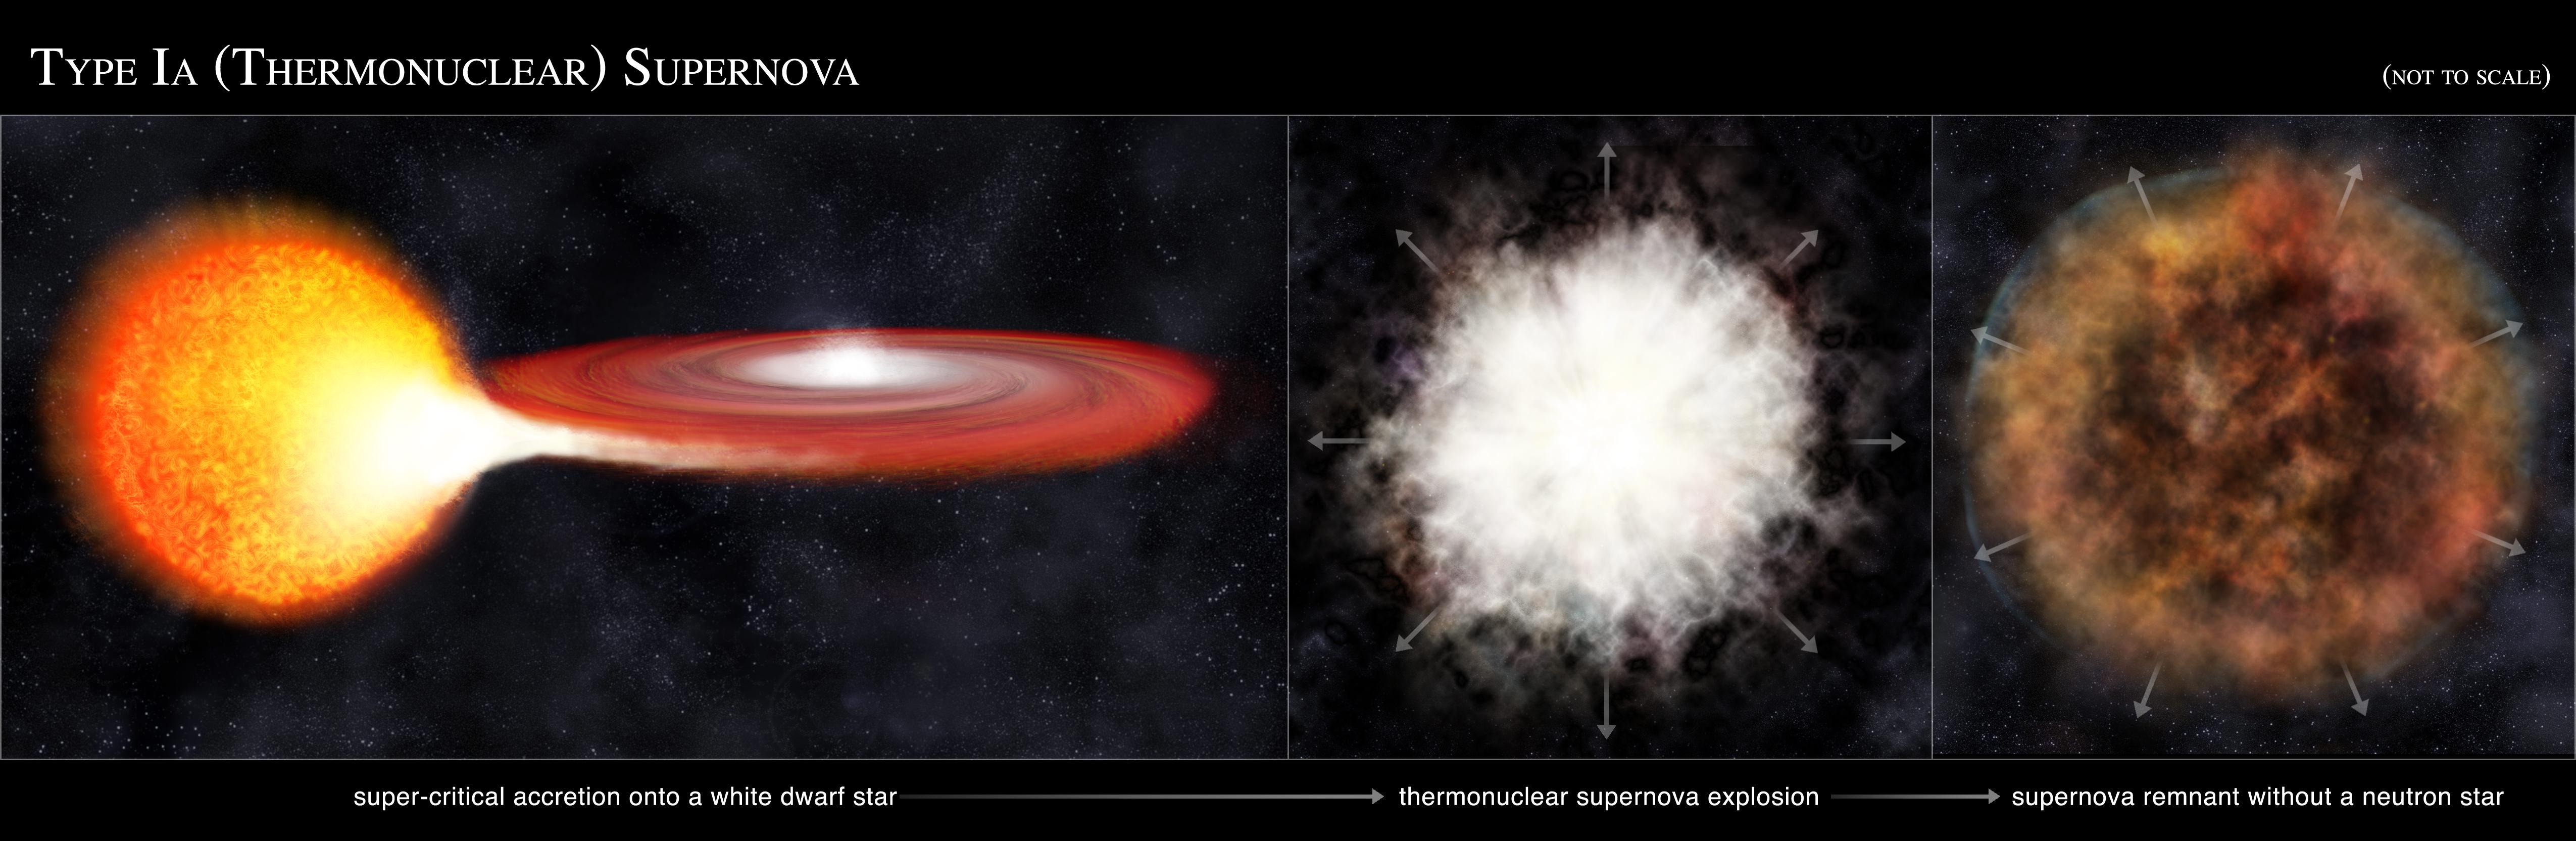 http://i0.wp.com/www.universetoday.com/wp-content/uploads/2014/01/Supernova-Type-I-illus-NASACXCM.Weiss_.jpg